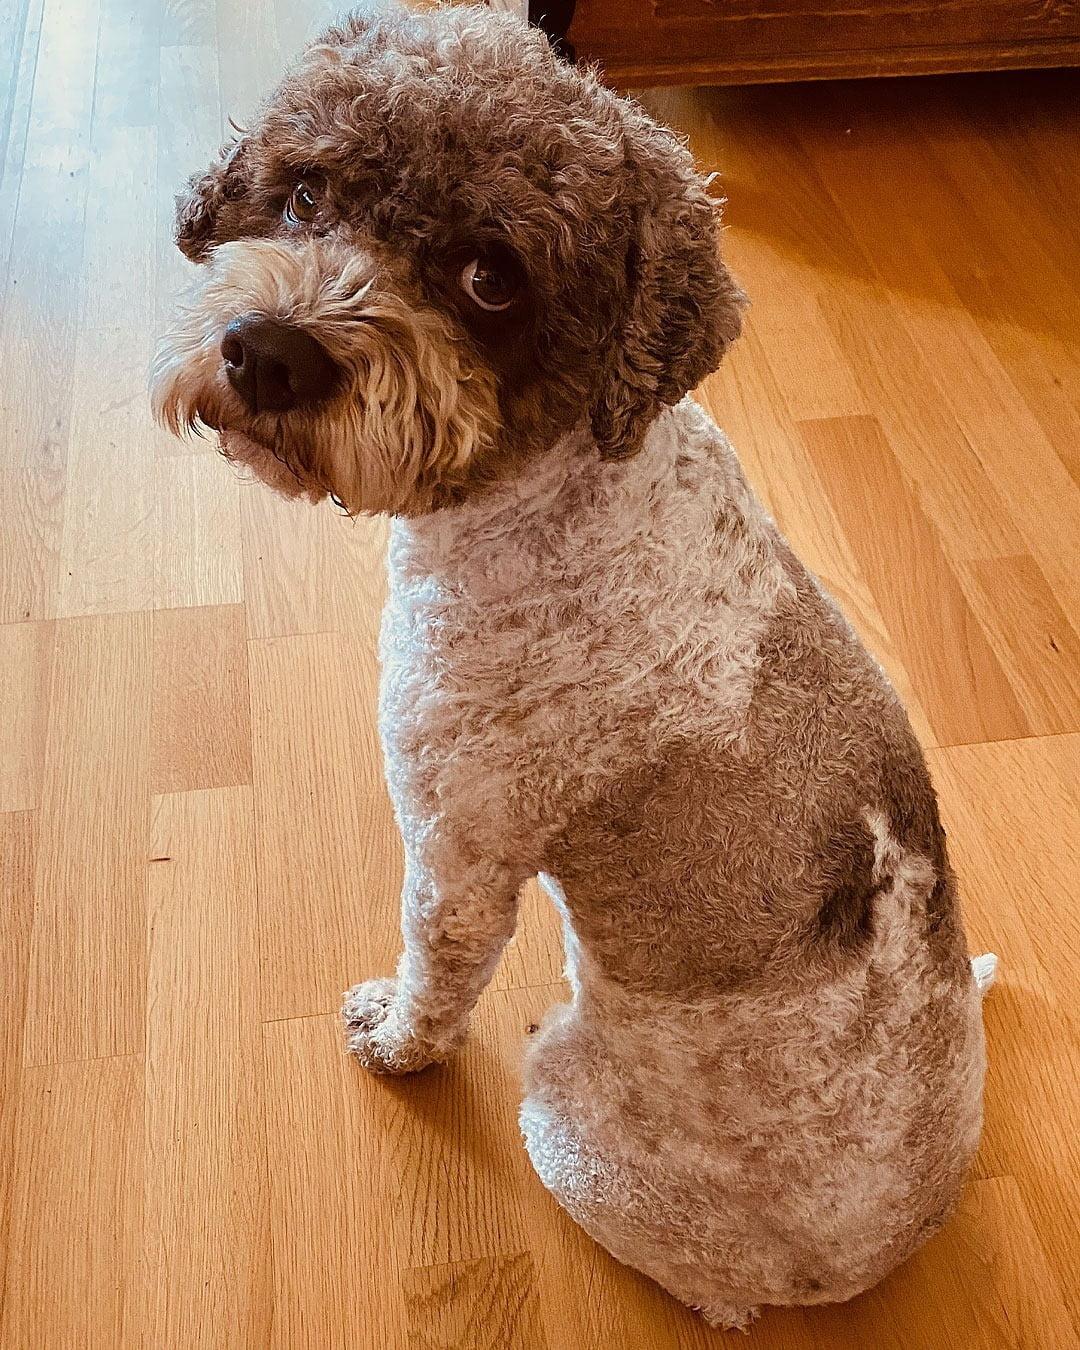 Thanks @dalahundtrim for a nice haircut!#lagottosofinstagram #lagottopuppy #italianwaterdog #truffledog  #lagottoromagnolo_daily #happydoglife #Lagotto #Dogs #DogsOfInstagram #Petstagram #Pets #Dogstagram #MyLife #MyDailyLife #PappaJagVillHaEnItalienare  #MacLagotto #Falun #Sweden #FF #l4l #instafollow @knappare @liminglindblad @k.rowntree @taxen_coco @h3lvetesjavlar This was posted by my Dad: @kristerlindholmfalun